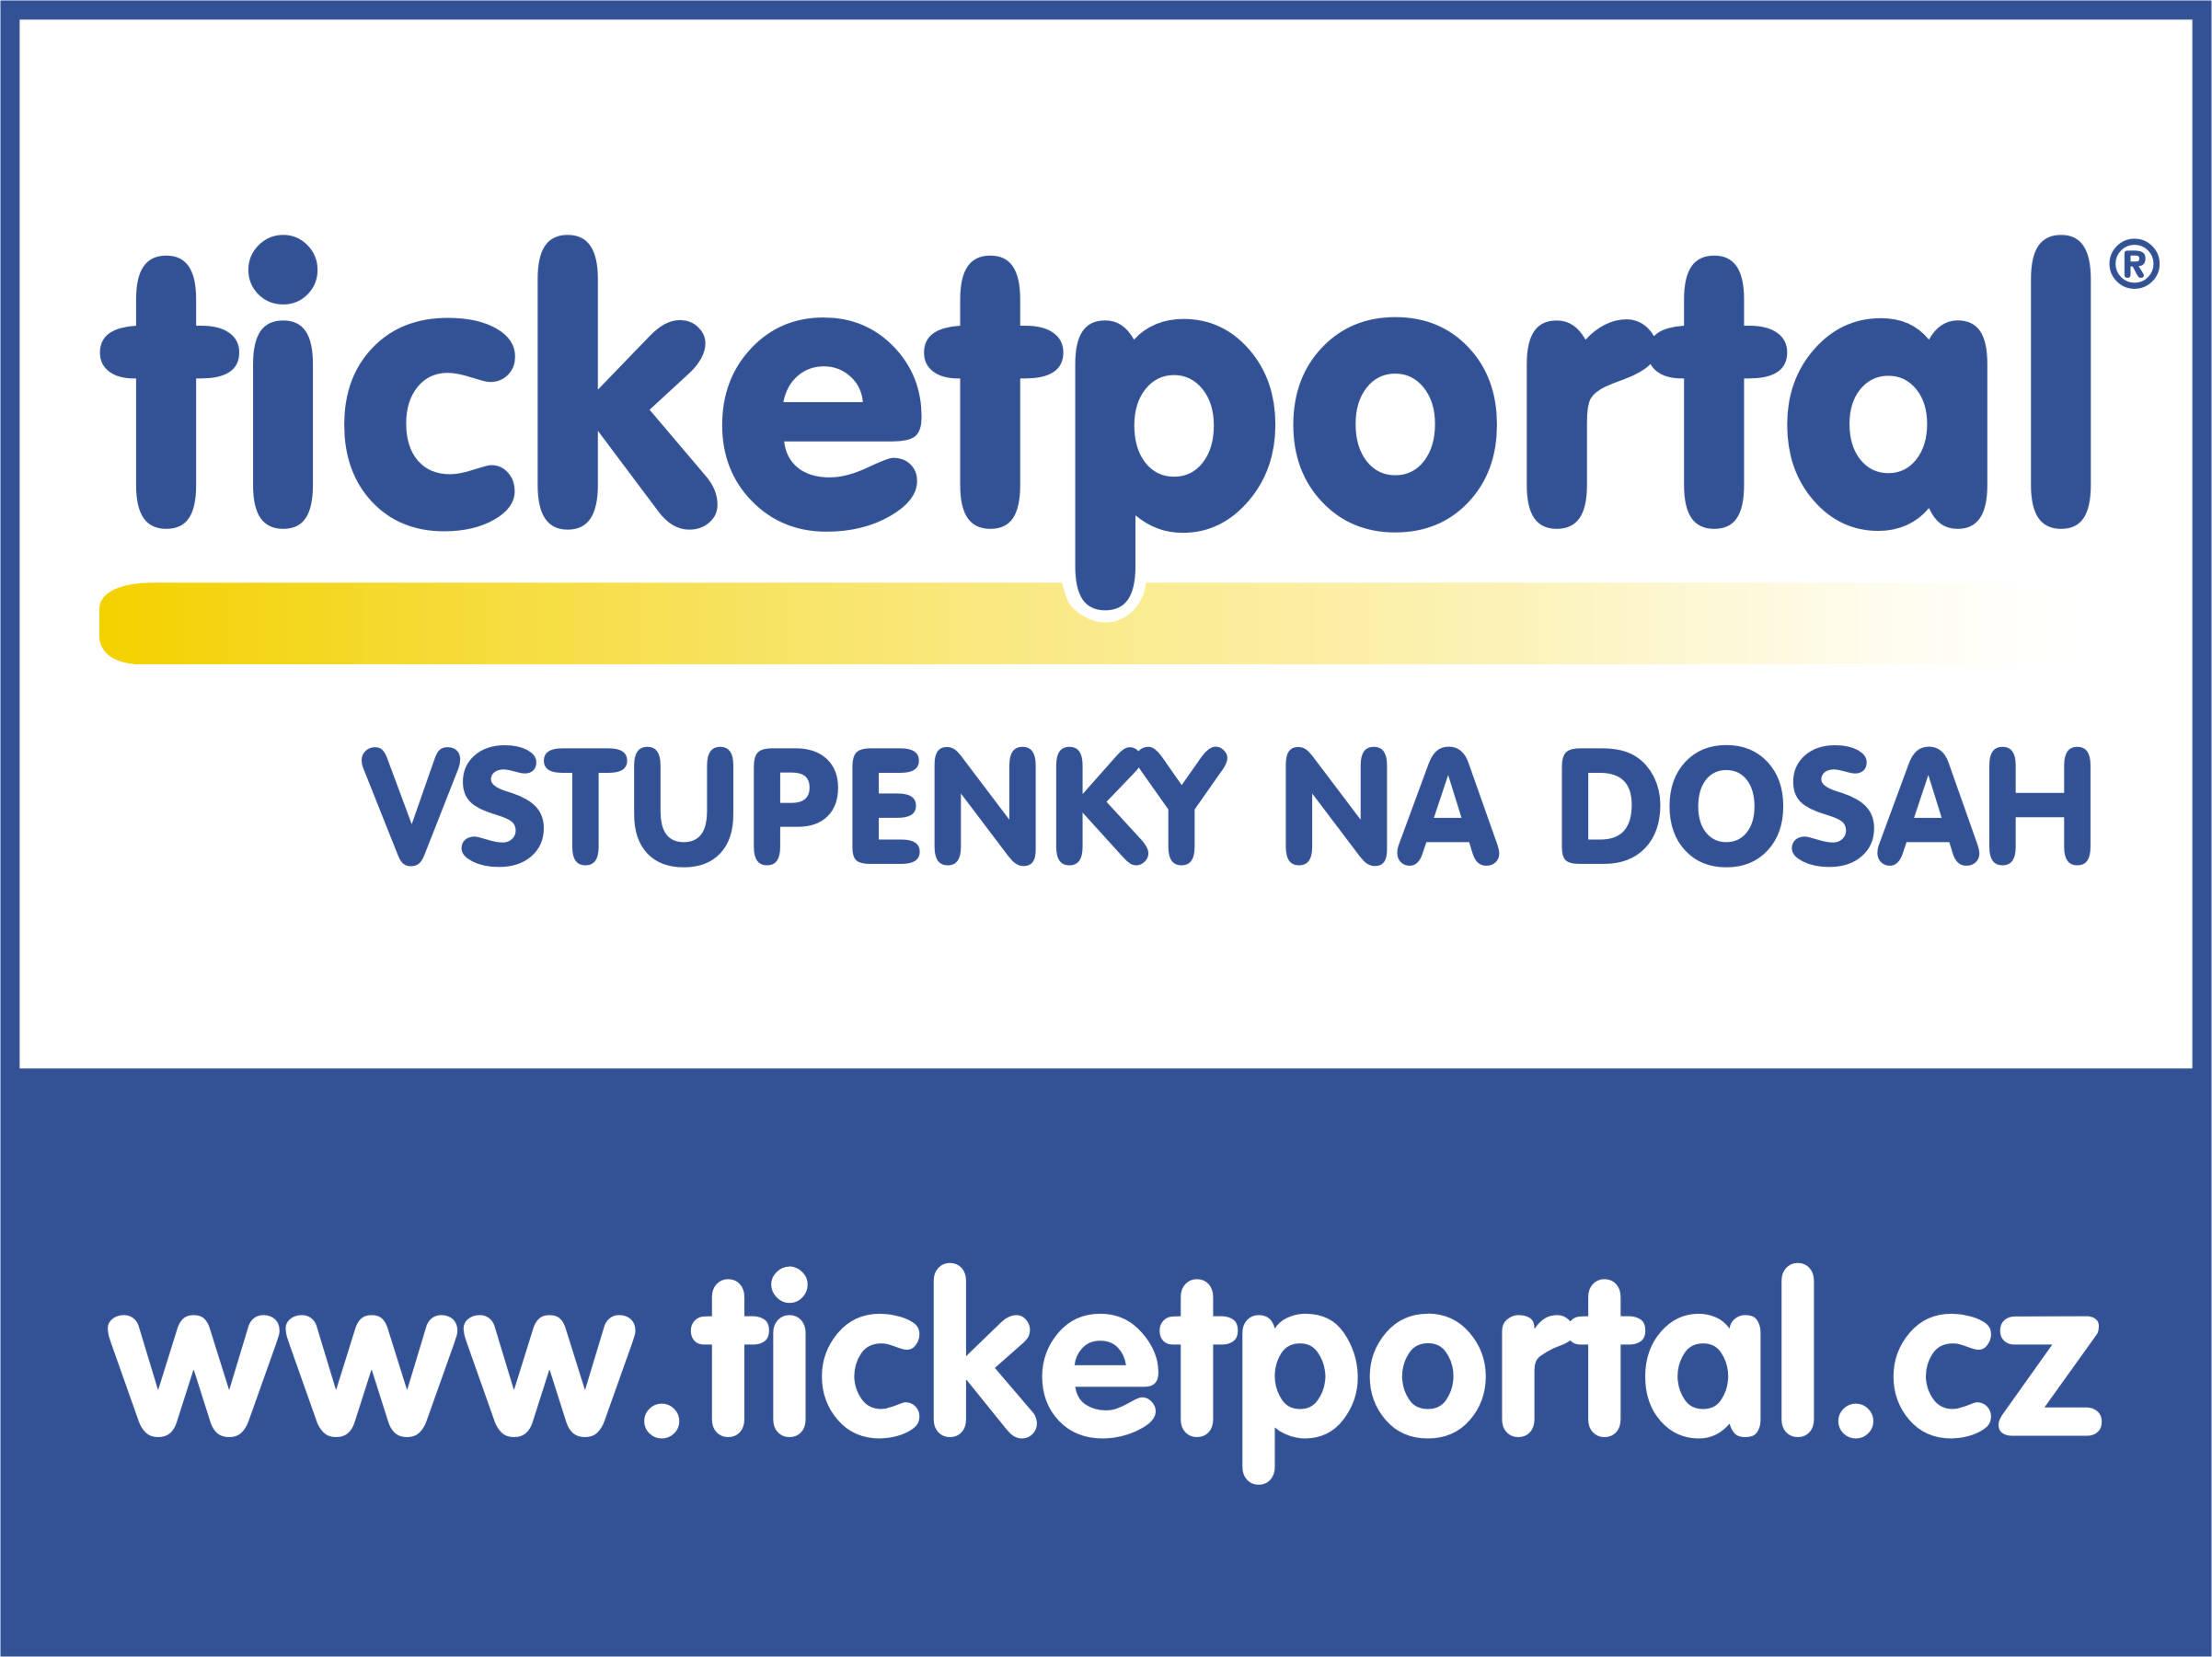 Ticket portal